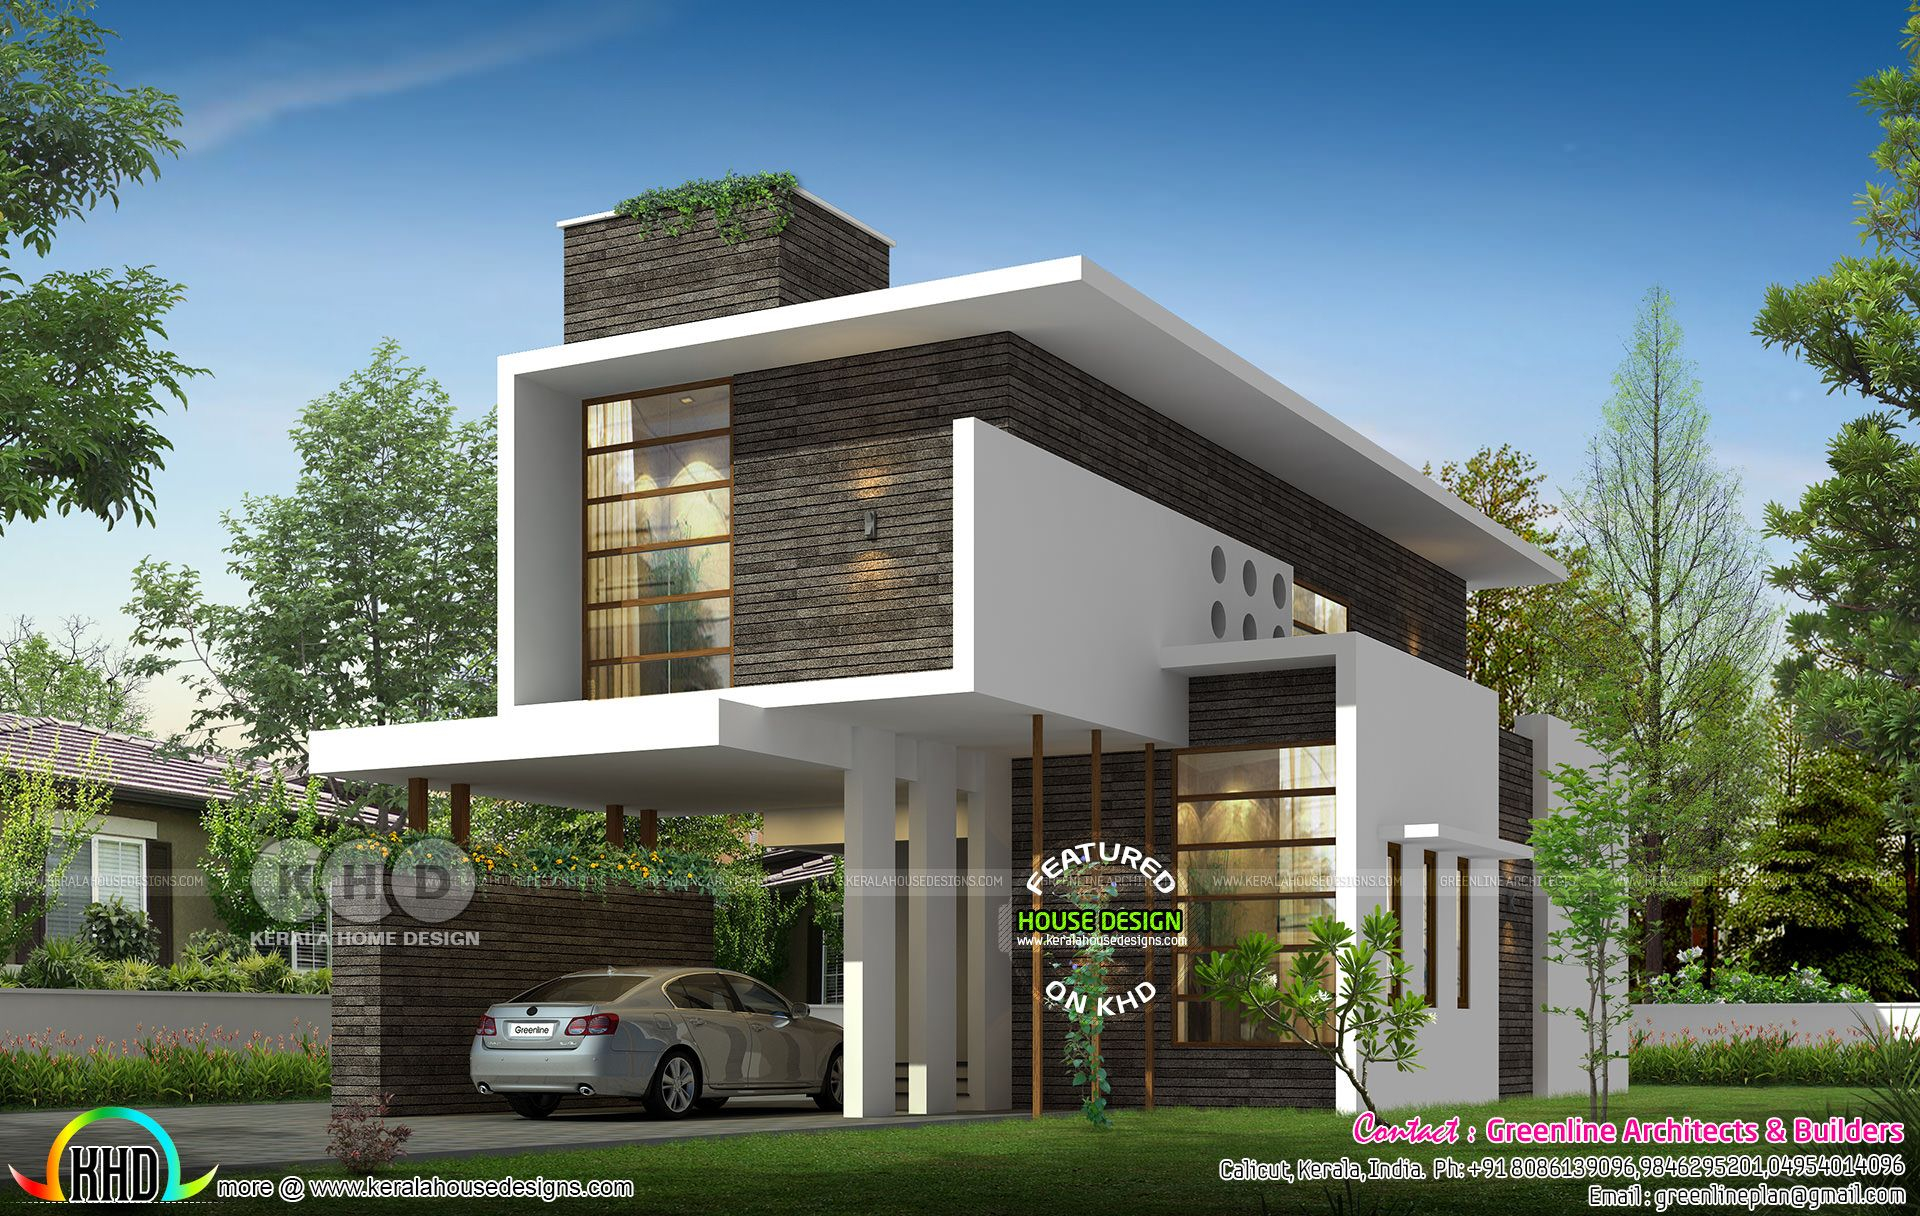 Kerala Ultra Modern House Design Jpg 1920 1216 Kerala House Design Bungalow House Design Home Building Design